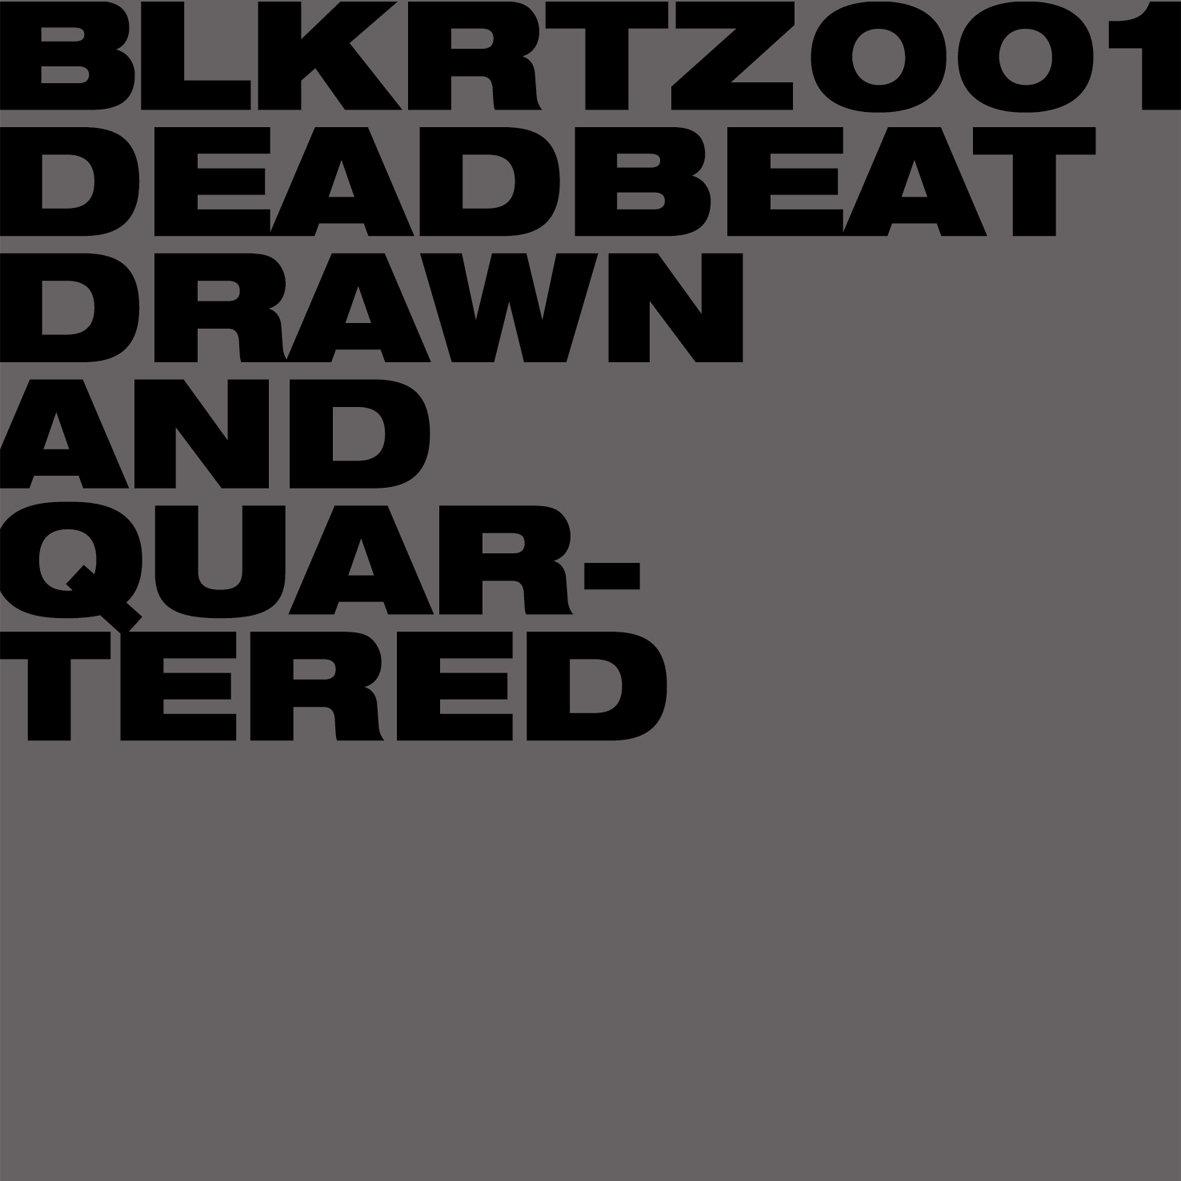 drawn and quartered deadbeat